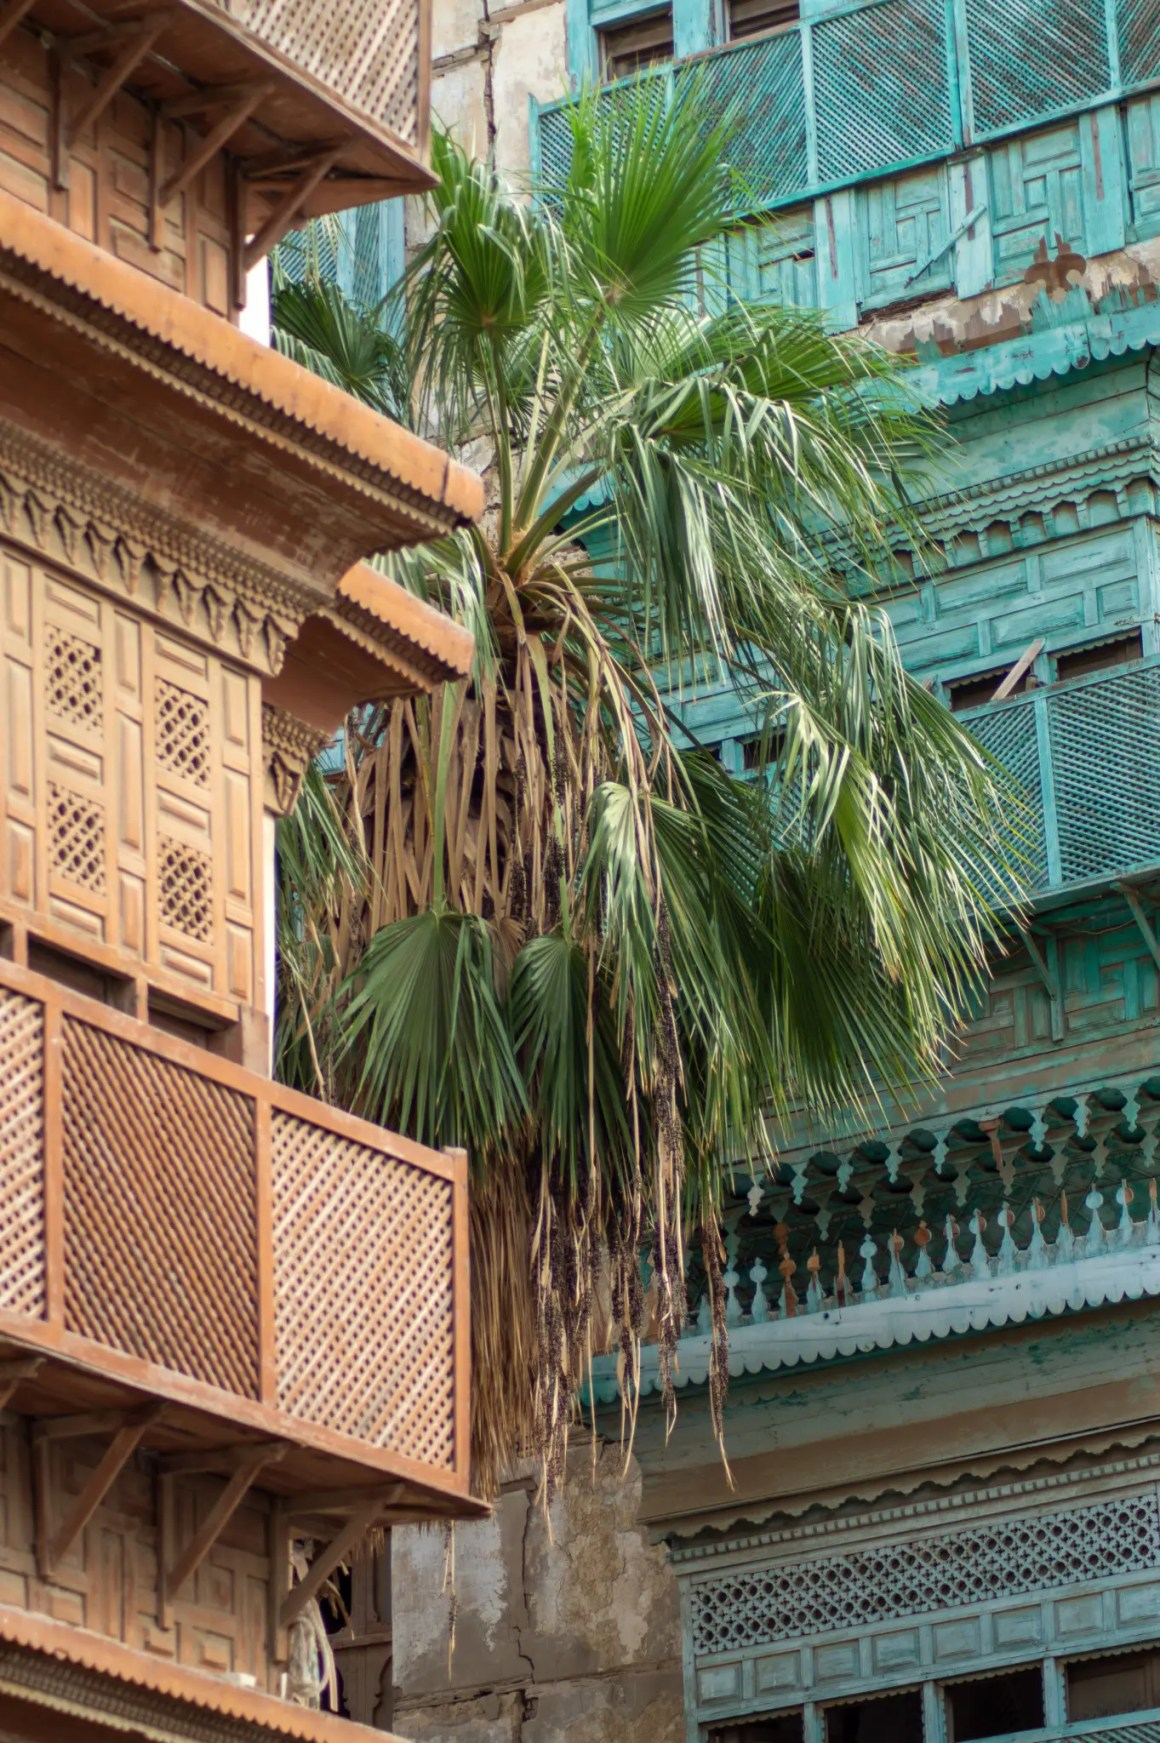 Palmbomen en houten details op de huizen in de oude binnenstad van Jeddah